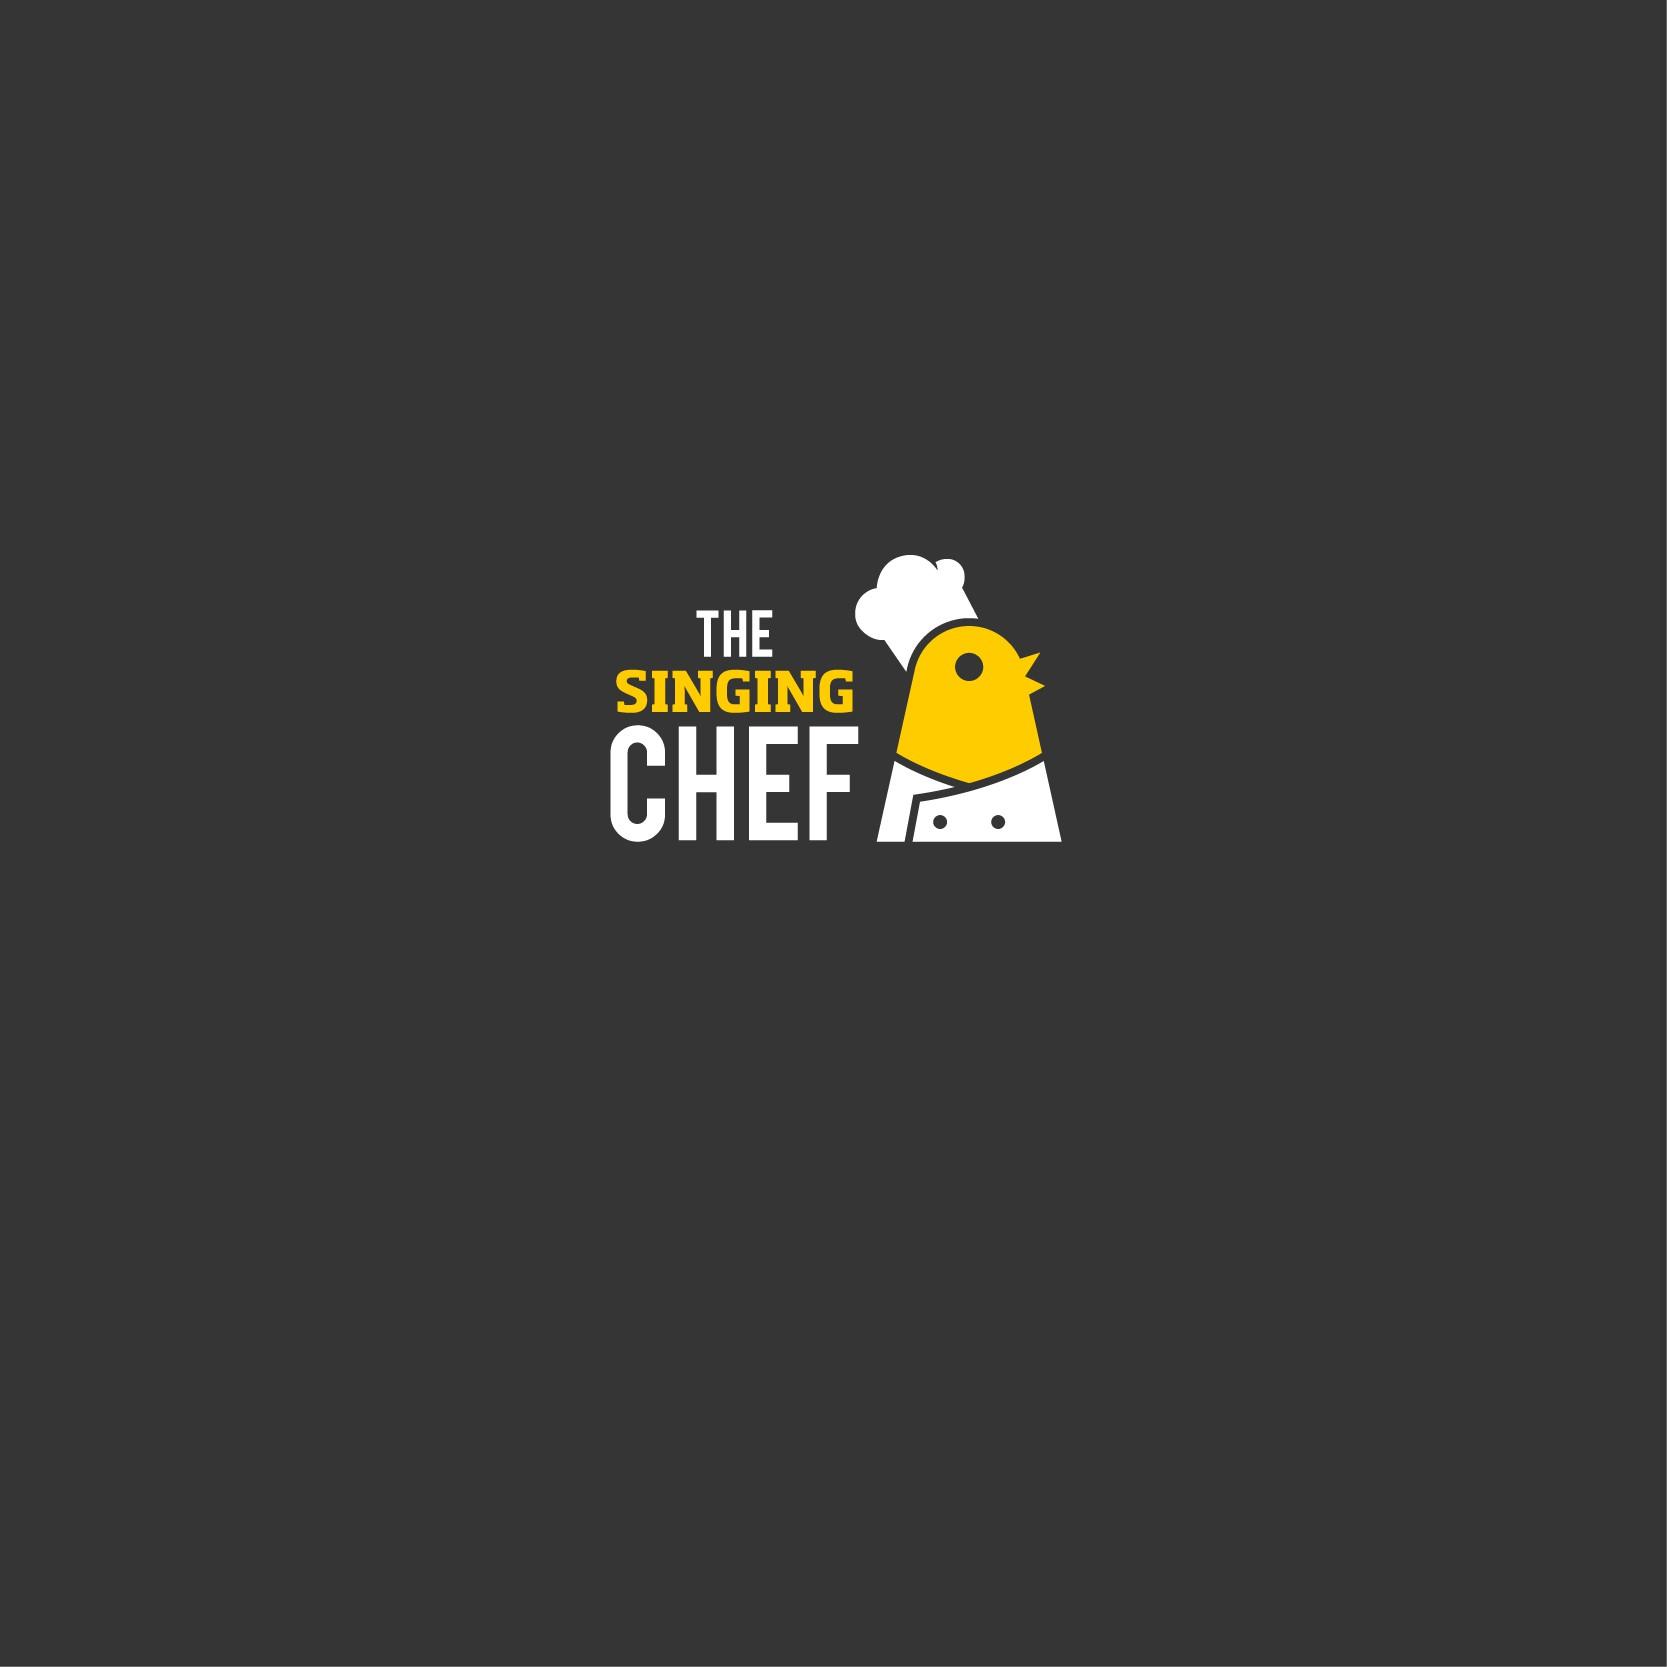 The Singing Chef Restaurant needs an identy